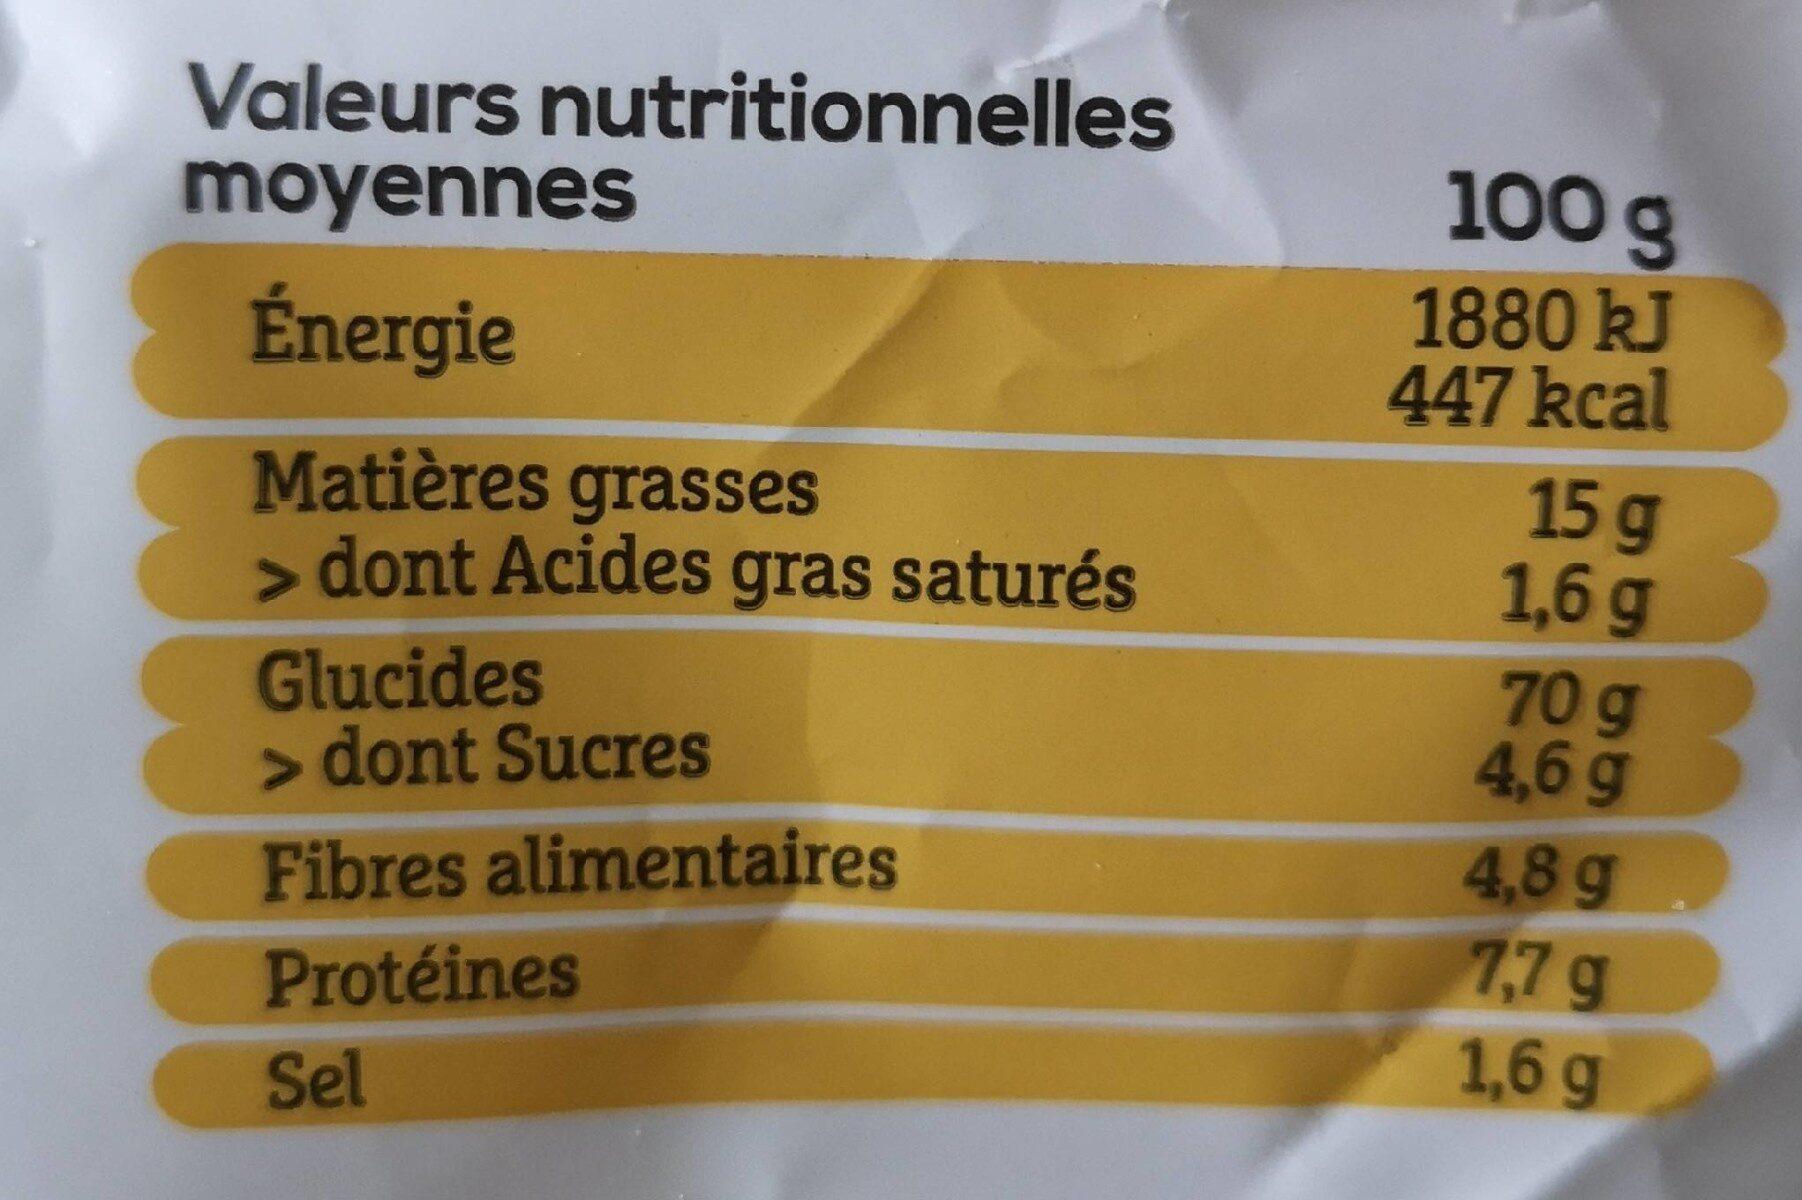 Les apéritifs Quinoa goût fromage - Voedingswaarden - fr